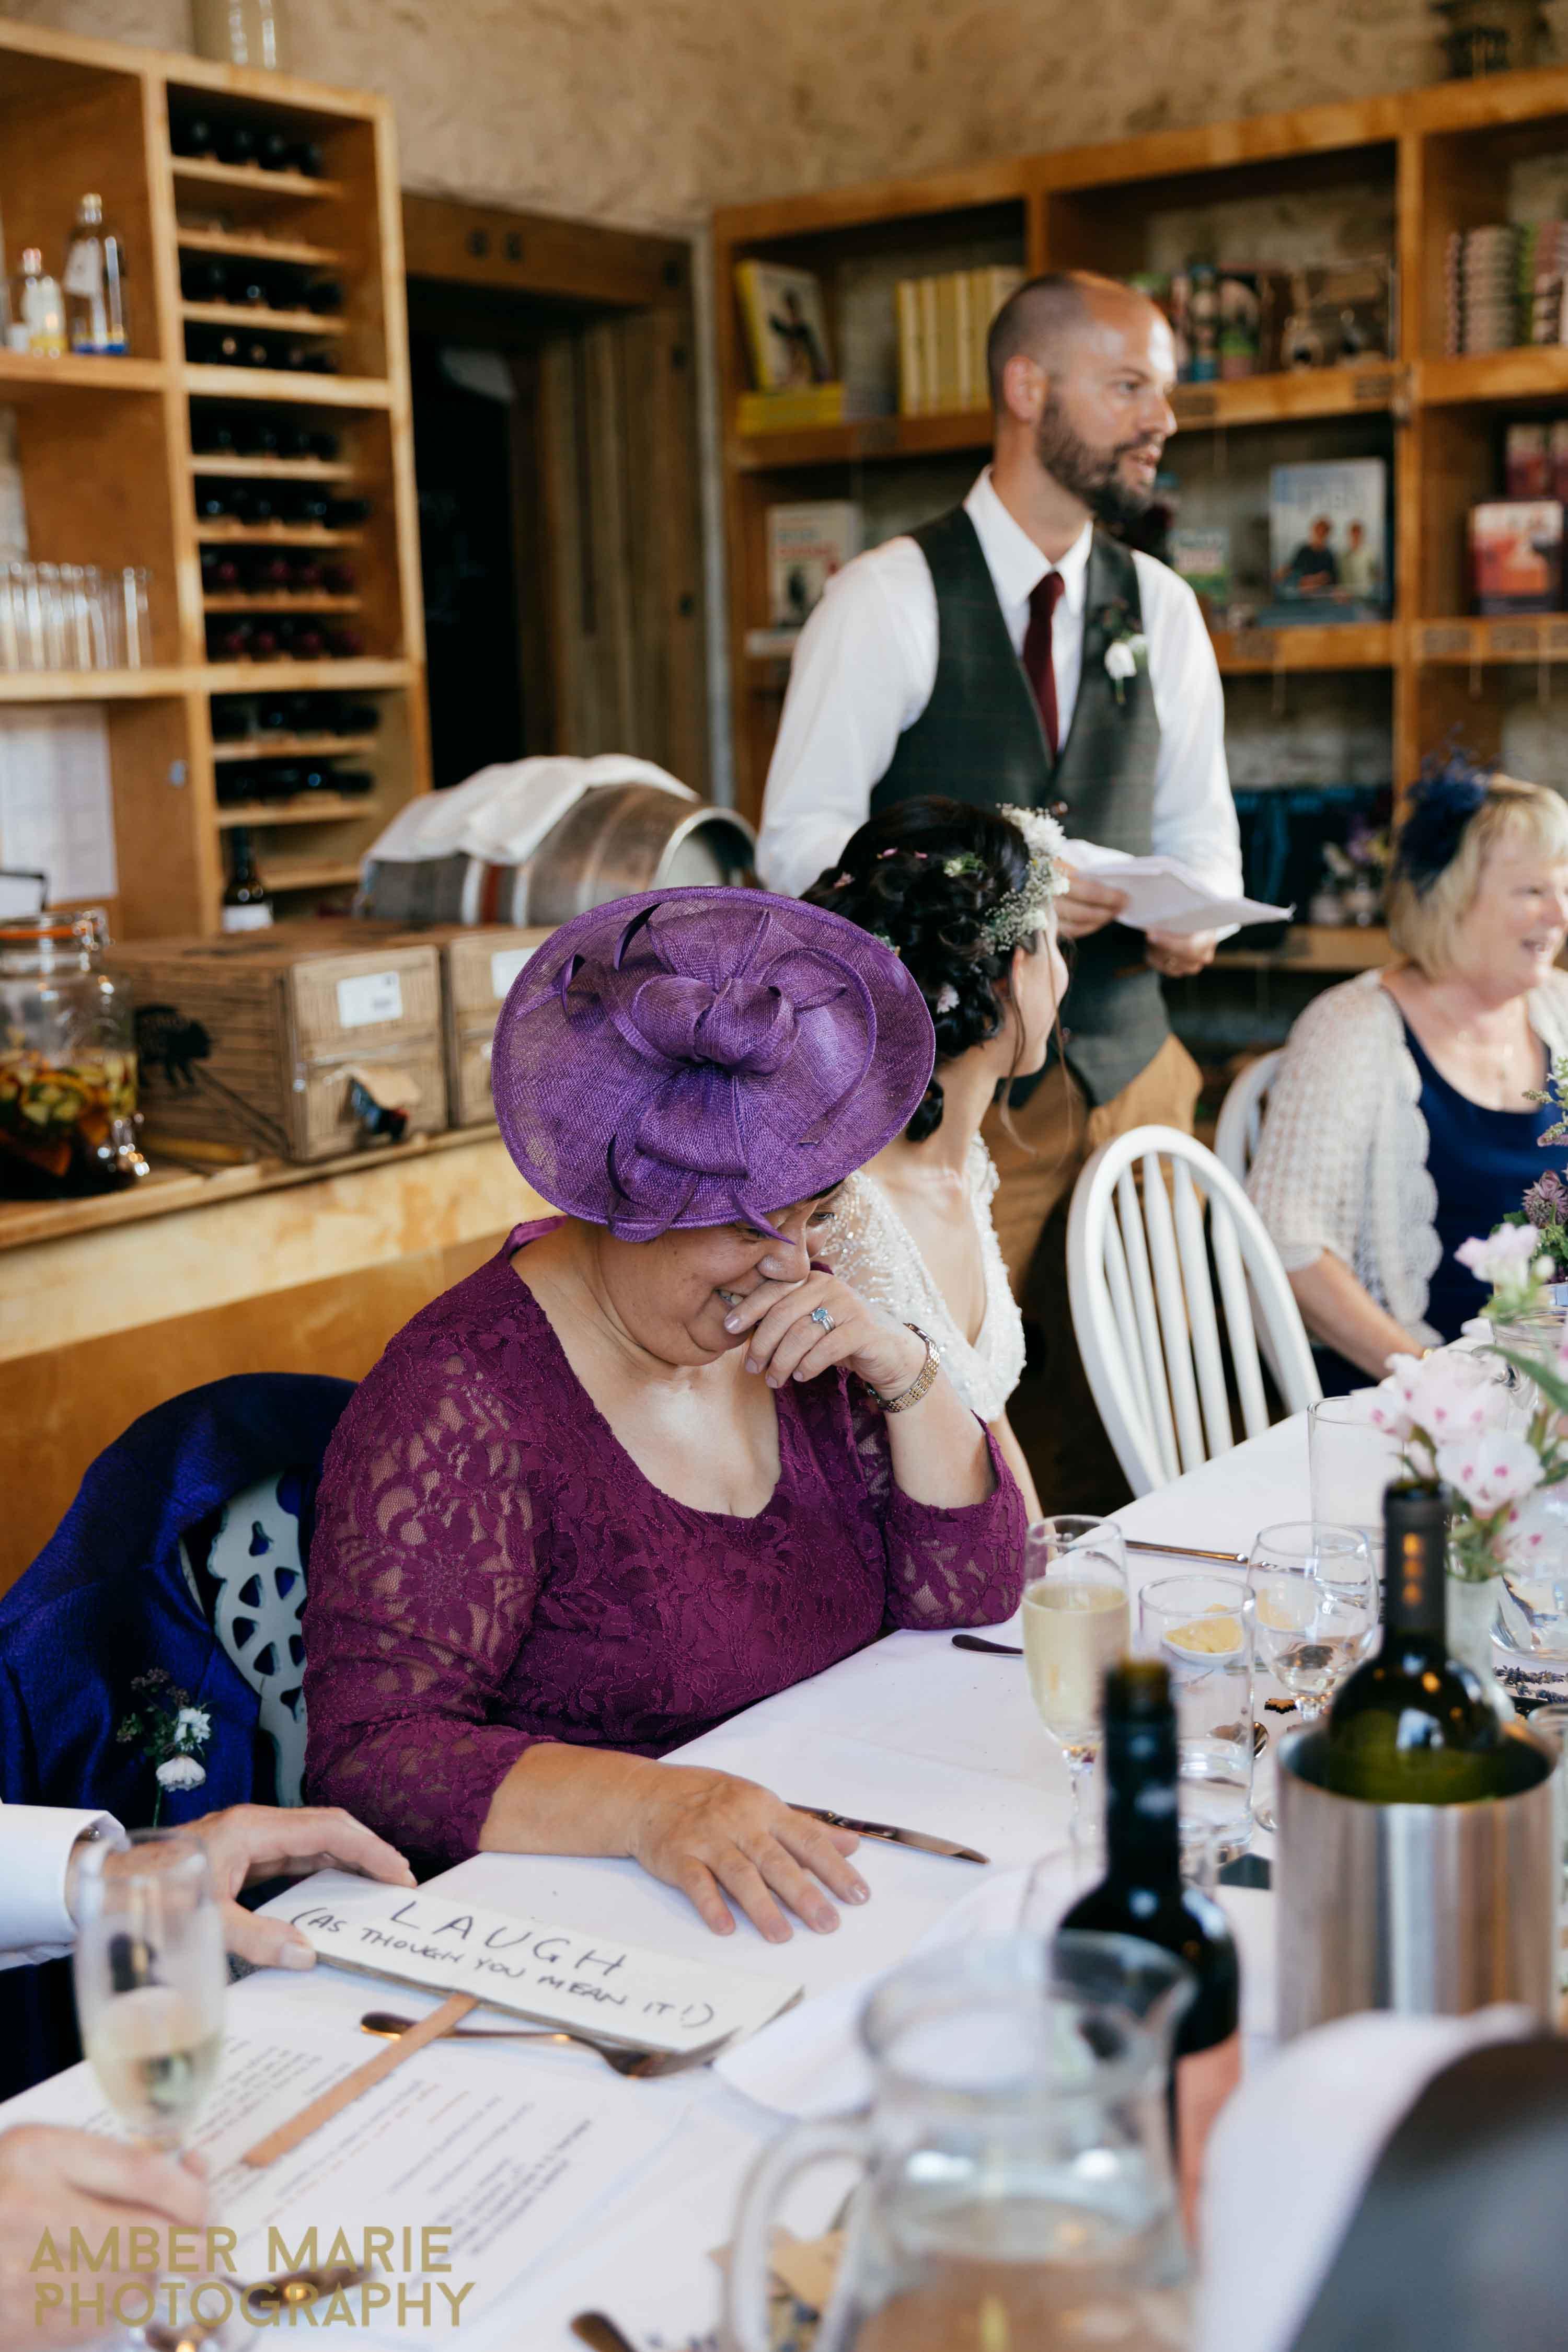 River cottage wedding photography creative wedding photographers leeds yorkshire